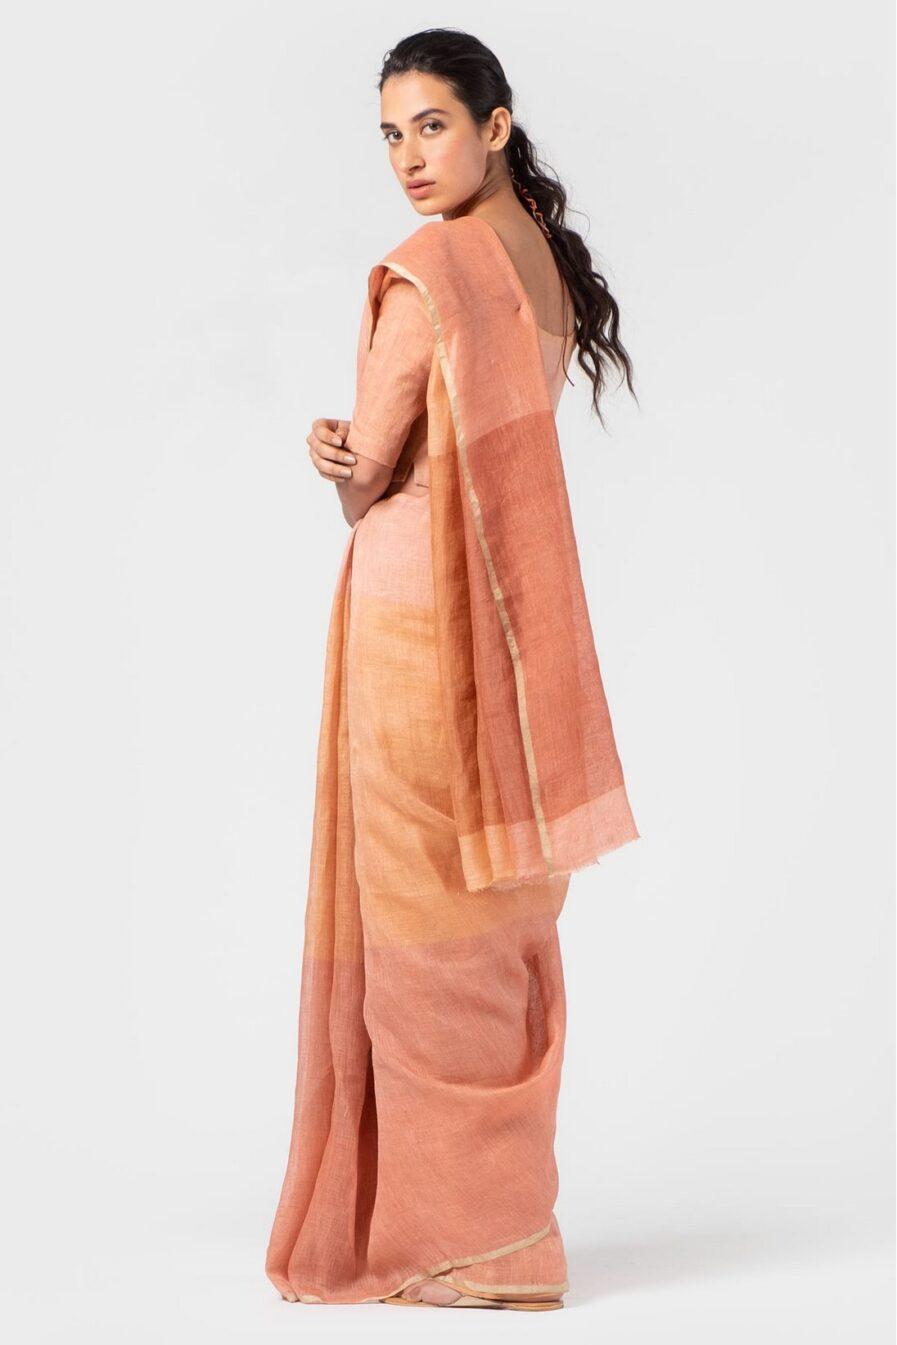 Anavila Graded peach summer sari